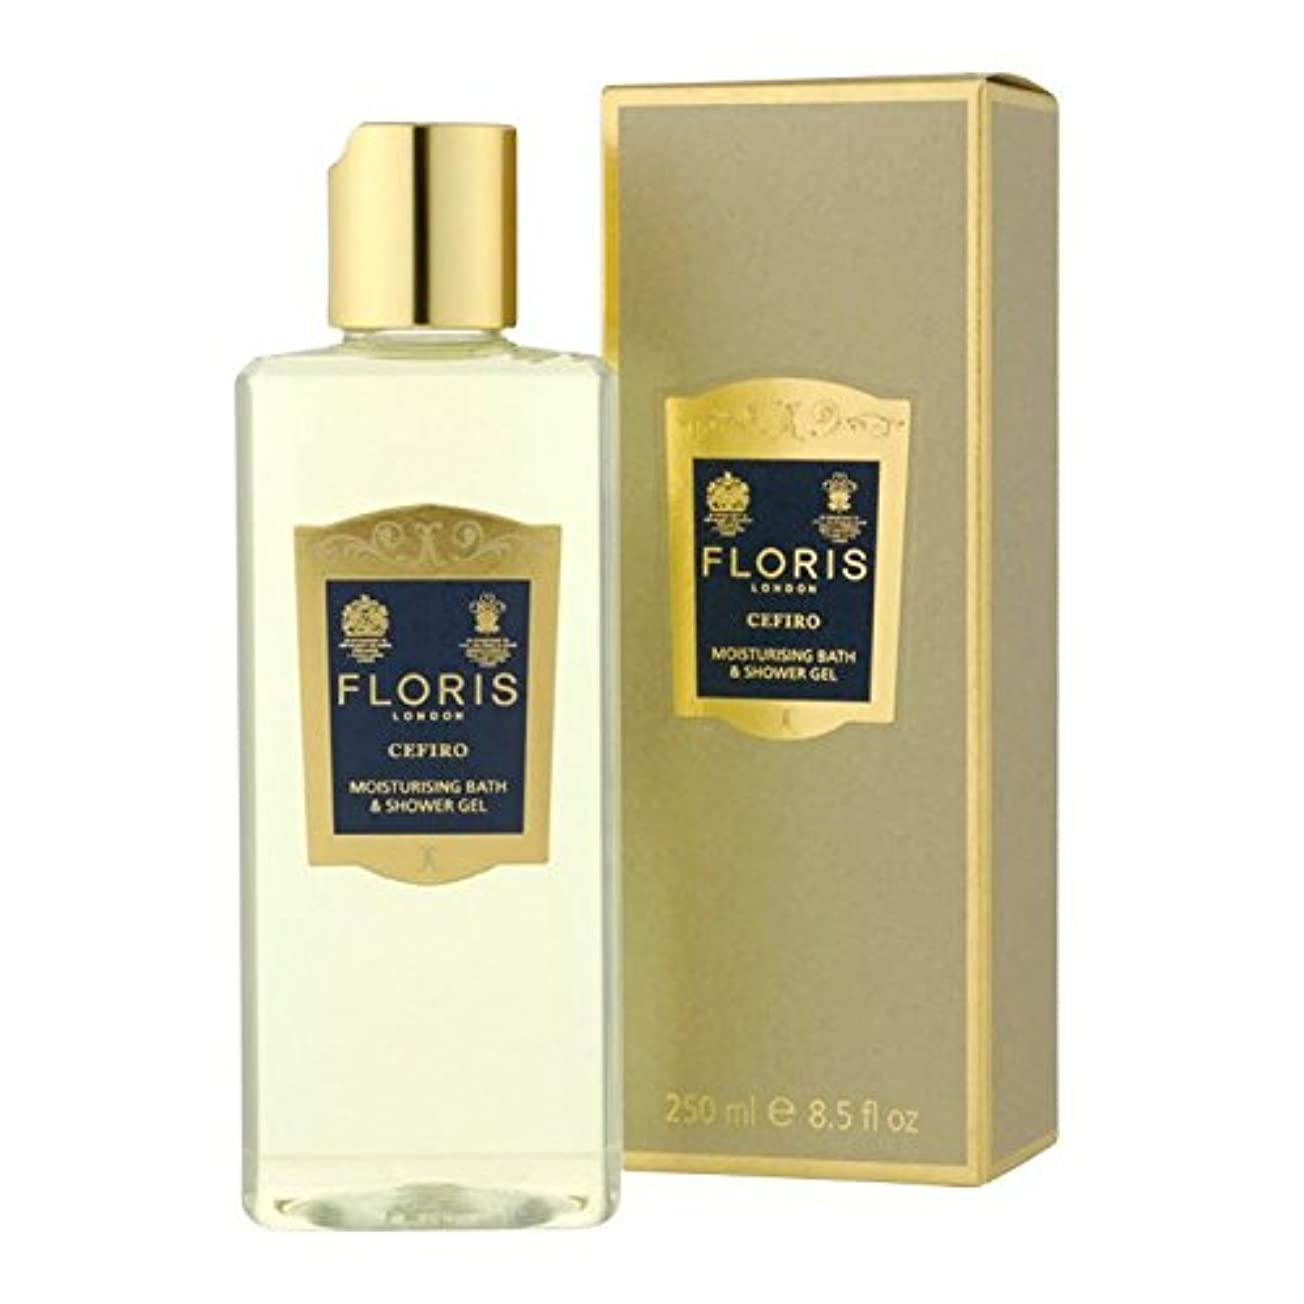 [Floris ] フロリスセフィーロの保湿入浴やシャワージェル250ミリリットル - Floris Cefiro Moisturising Bath and Shower Gel 250ml [並行輸入品]